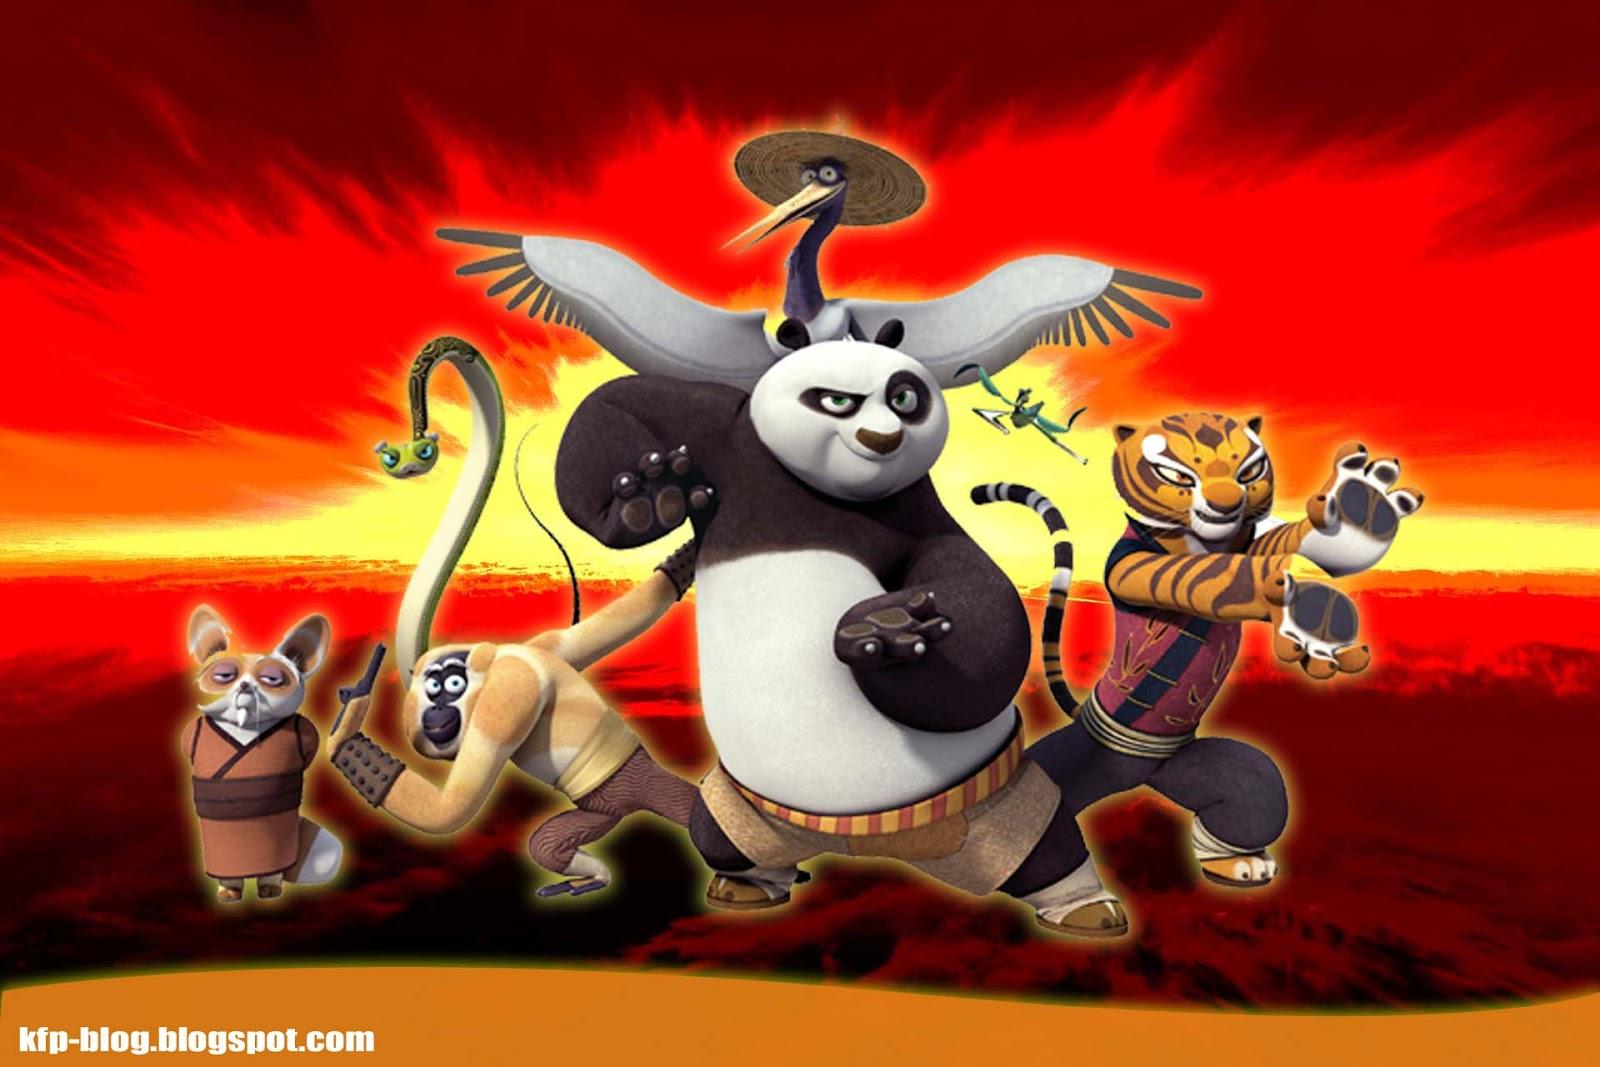 Kung Fu Panda 3 (2016) HD Wallpapers for Desktop and Mobiles